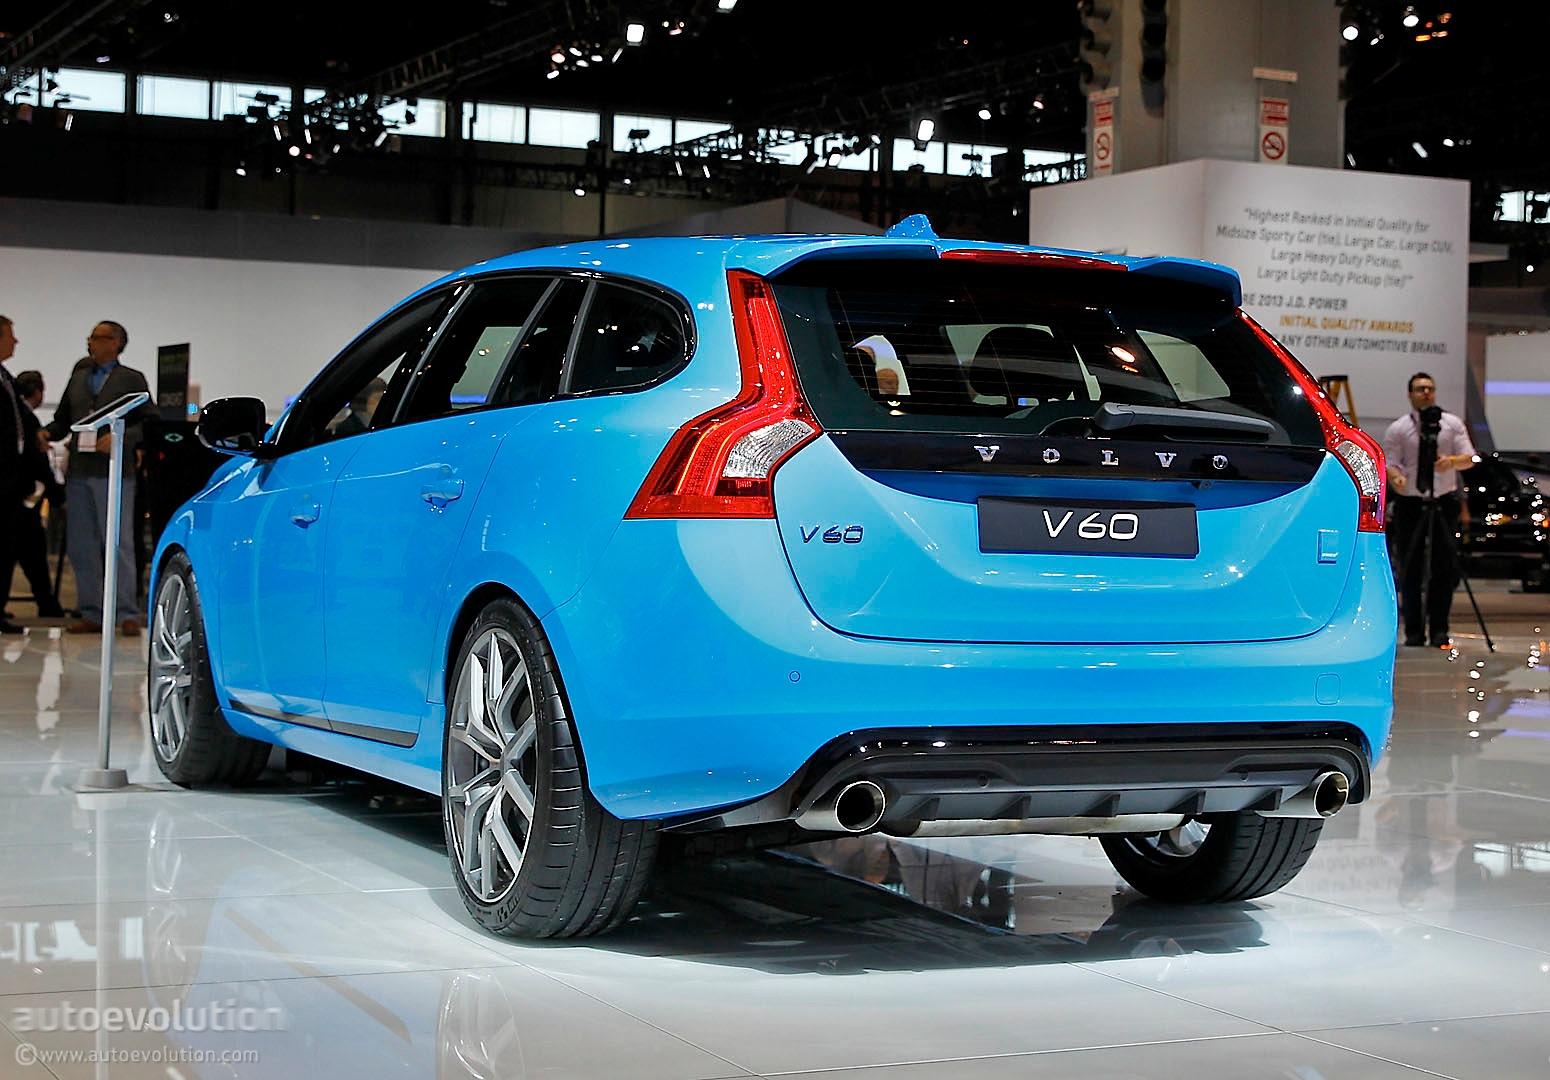 Volvo V60 Polestar Is a Blue Wagon in Chicago [Live Photo] - autoevolution